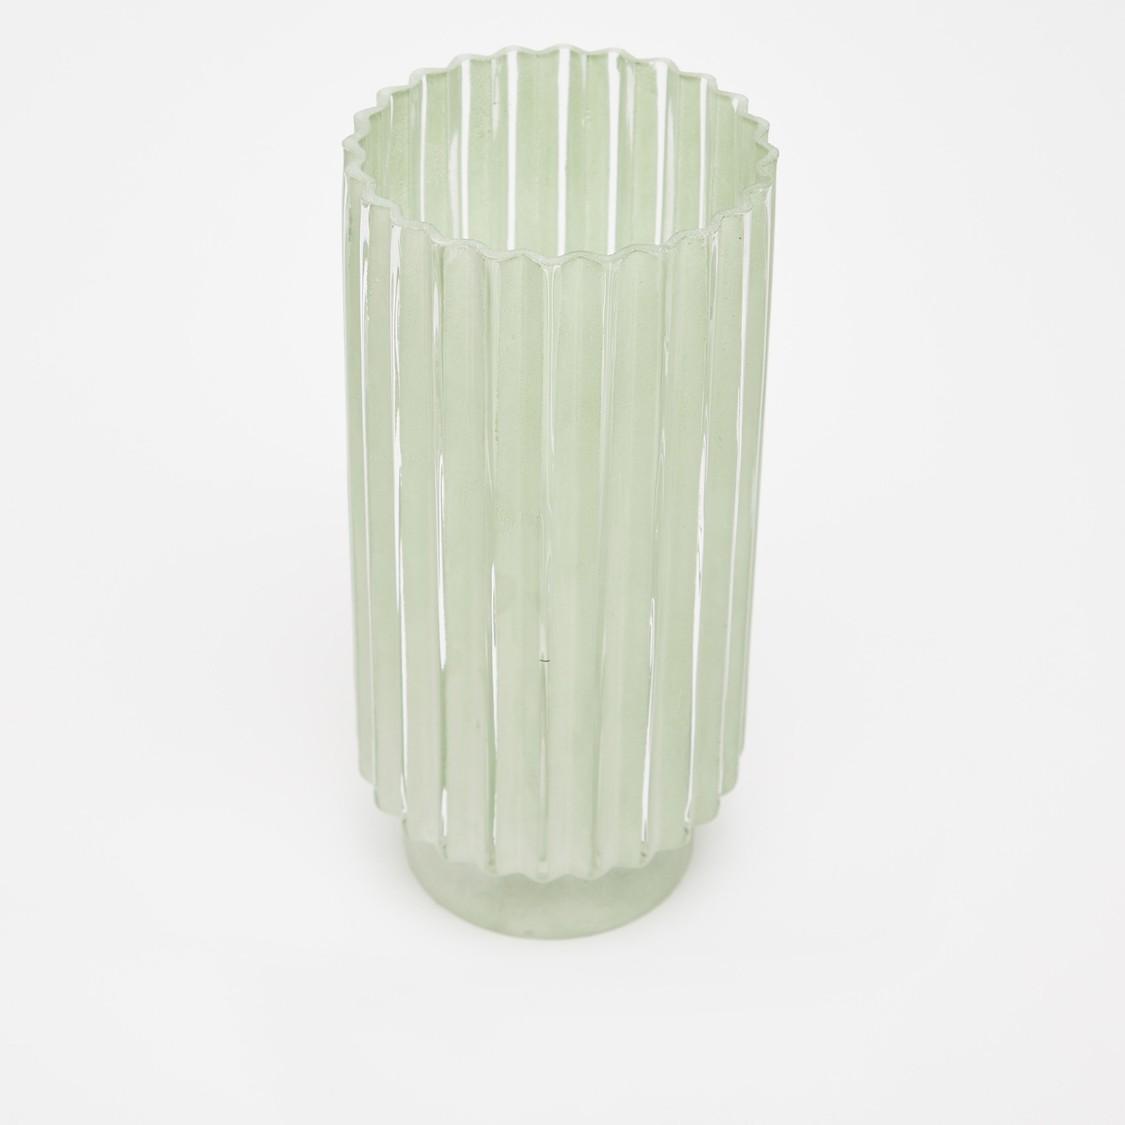 Decorative Patterned Cylindrical Vase - 24.5x12 cms